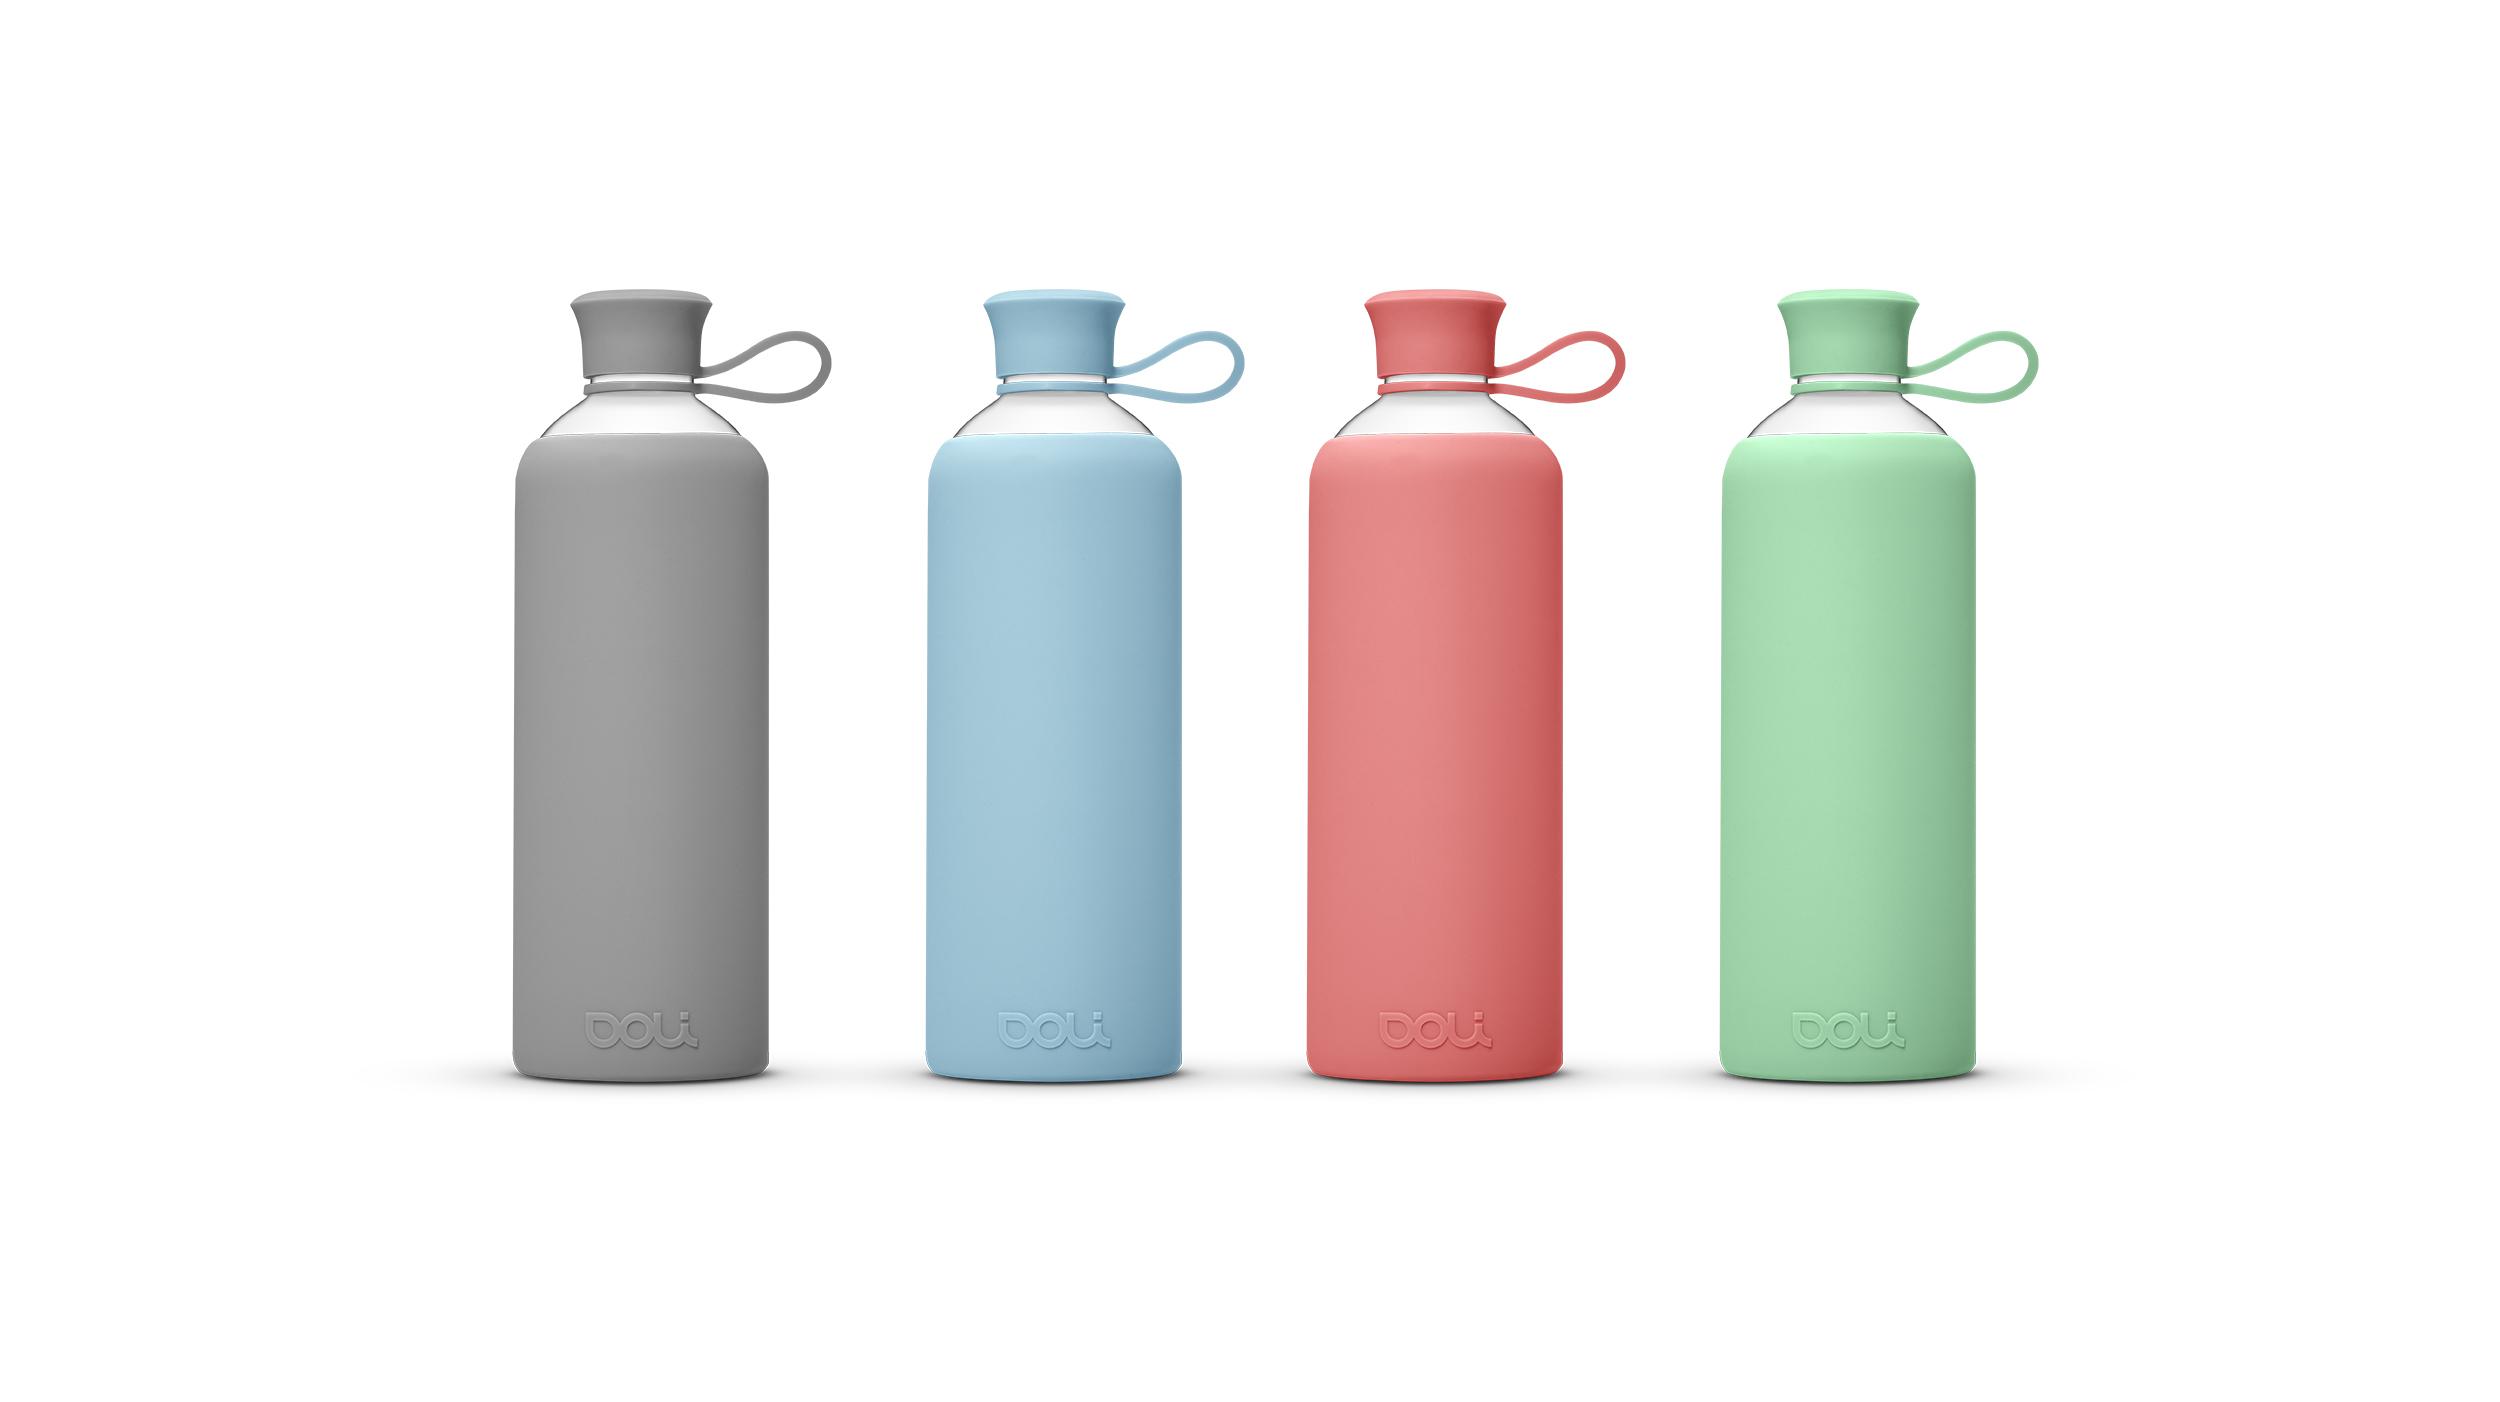 doli trinkflasche aus glas mit silikonh lle 550ml flasche mit h lle aus silikon pure and green. Black Bedroom Furniture Sets. Home Design Ideas